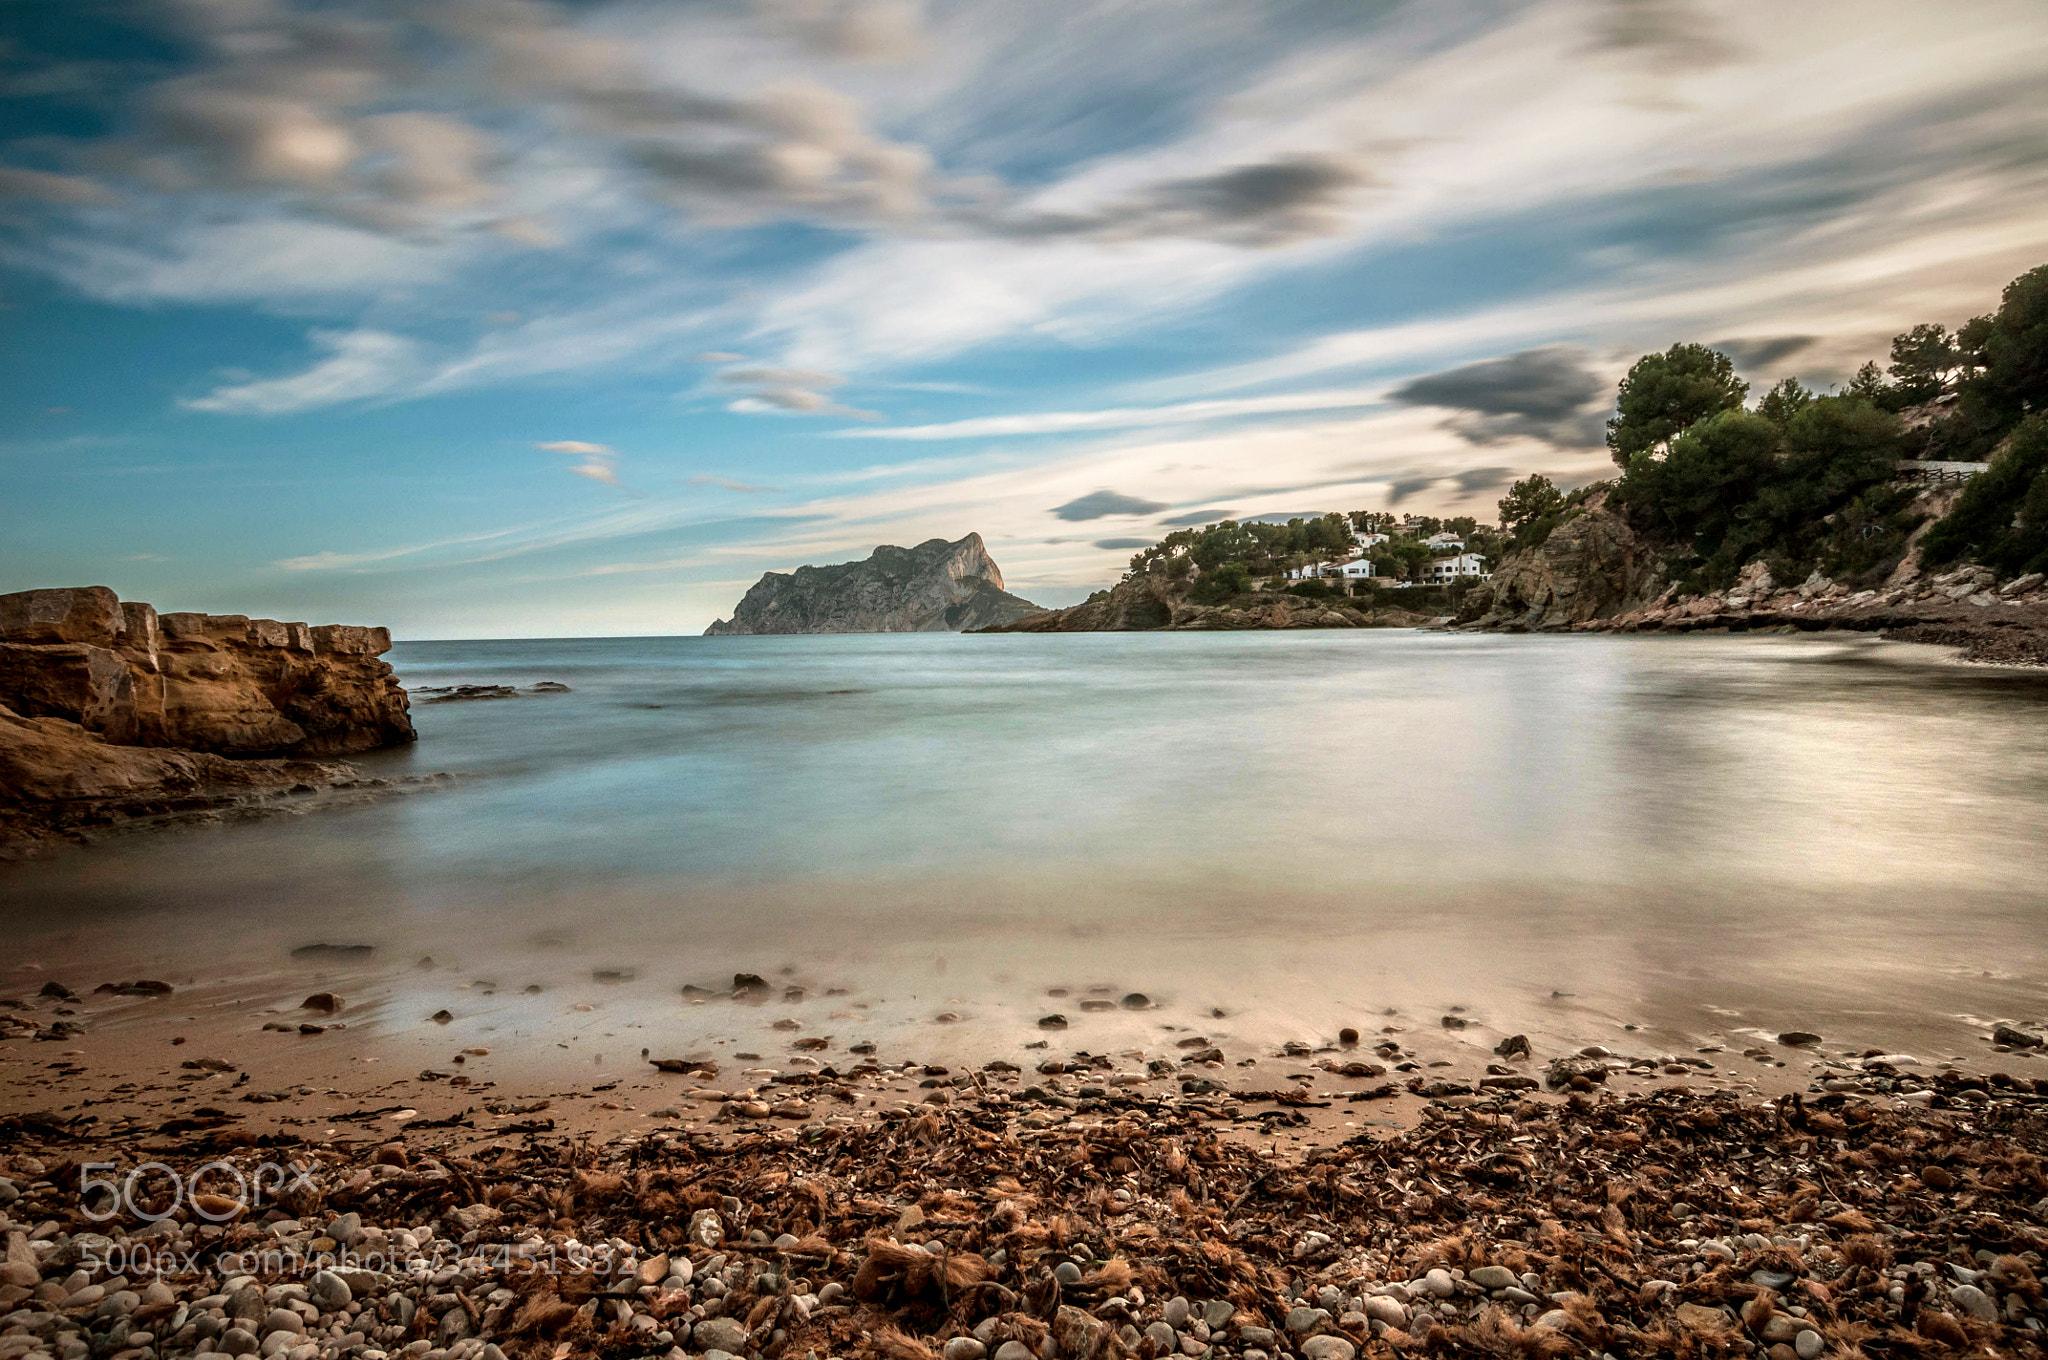 Photograph Cala Pinets by Christian Merk on 500px